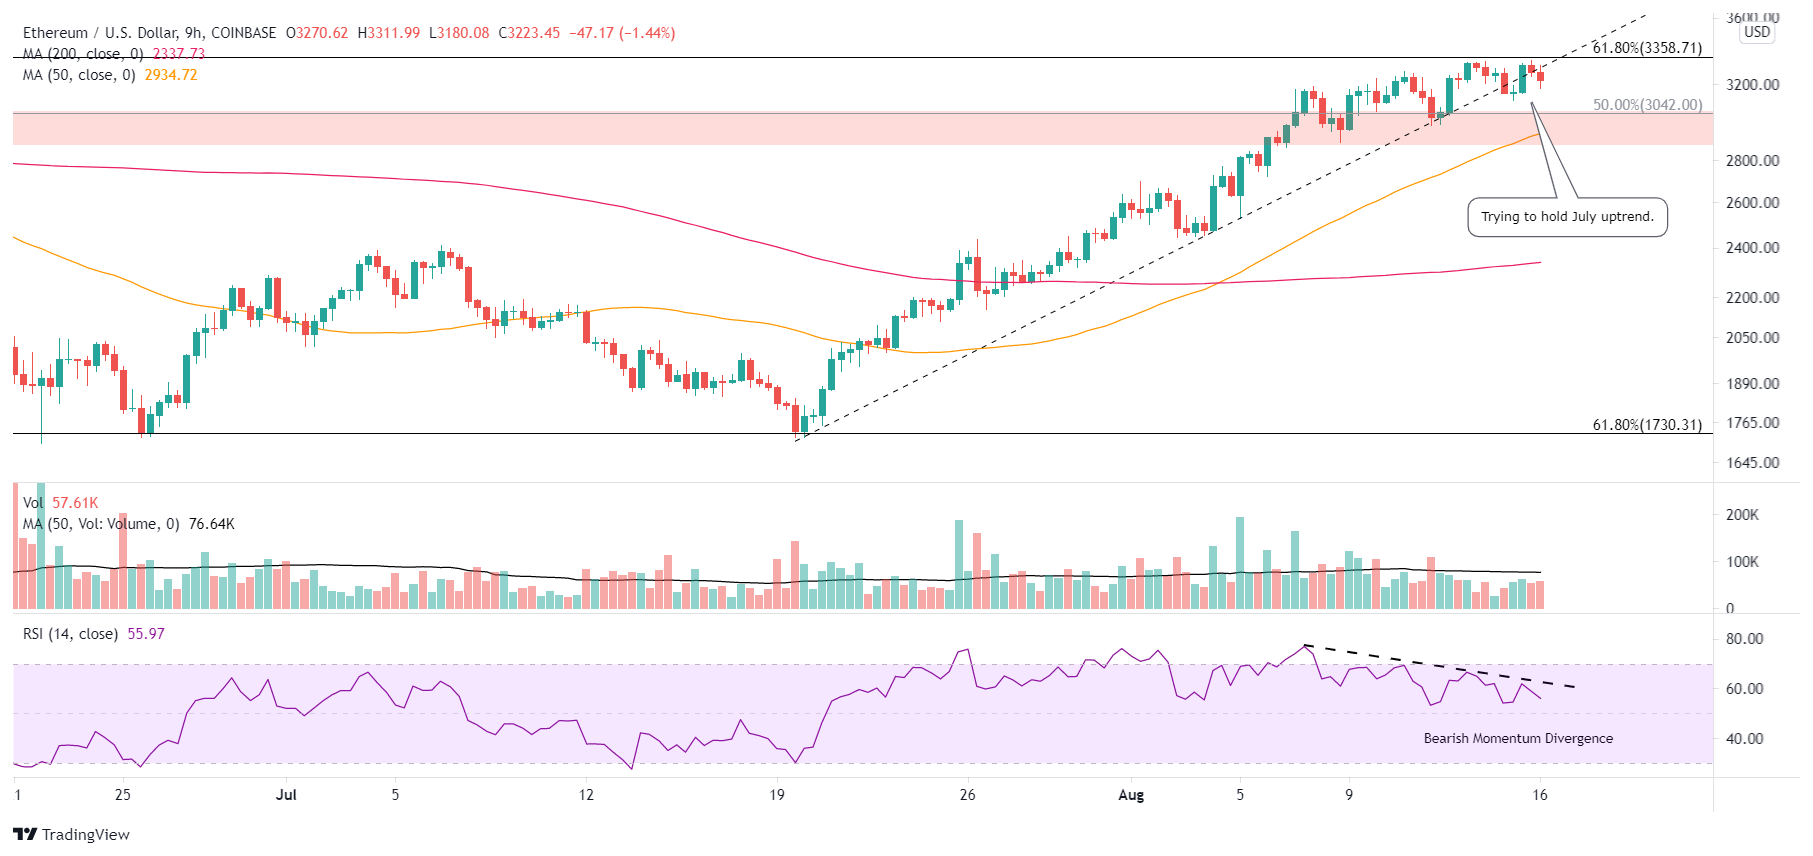 ETH/USD 9-hour chart